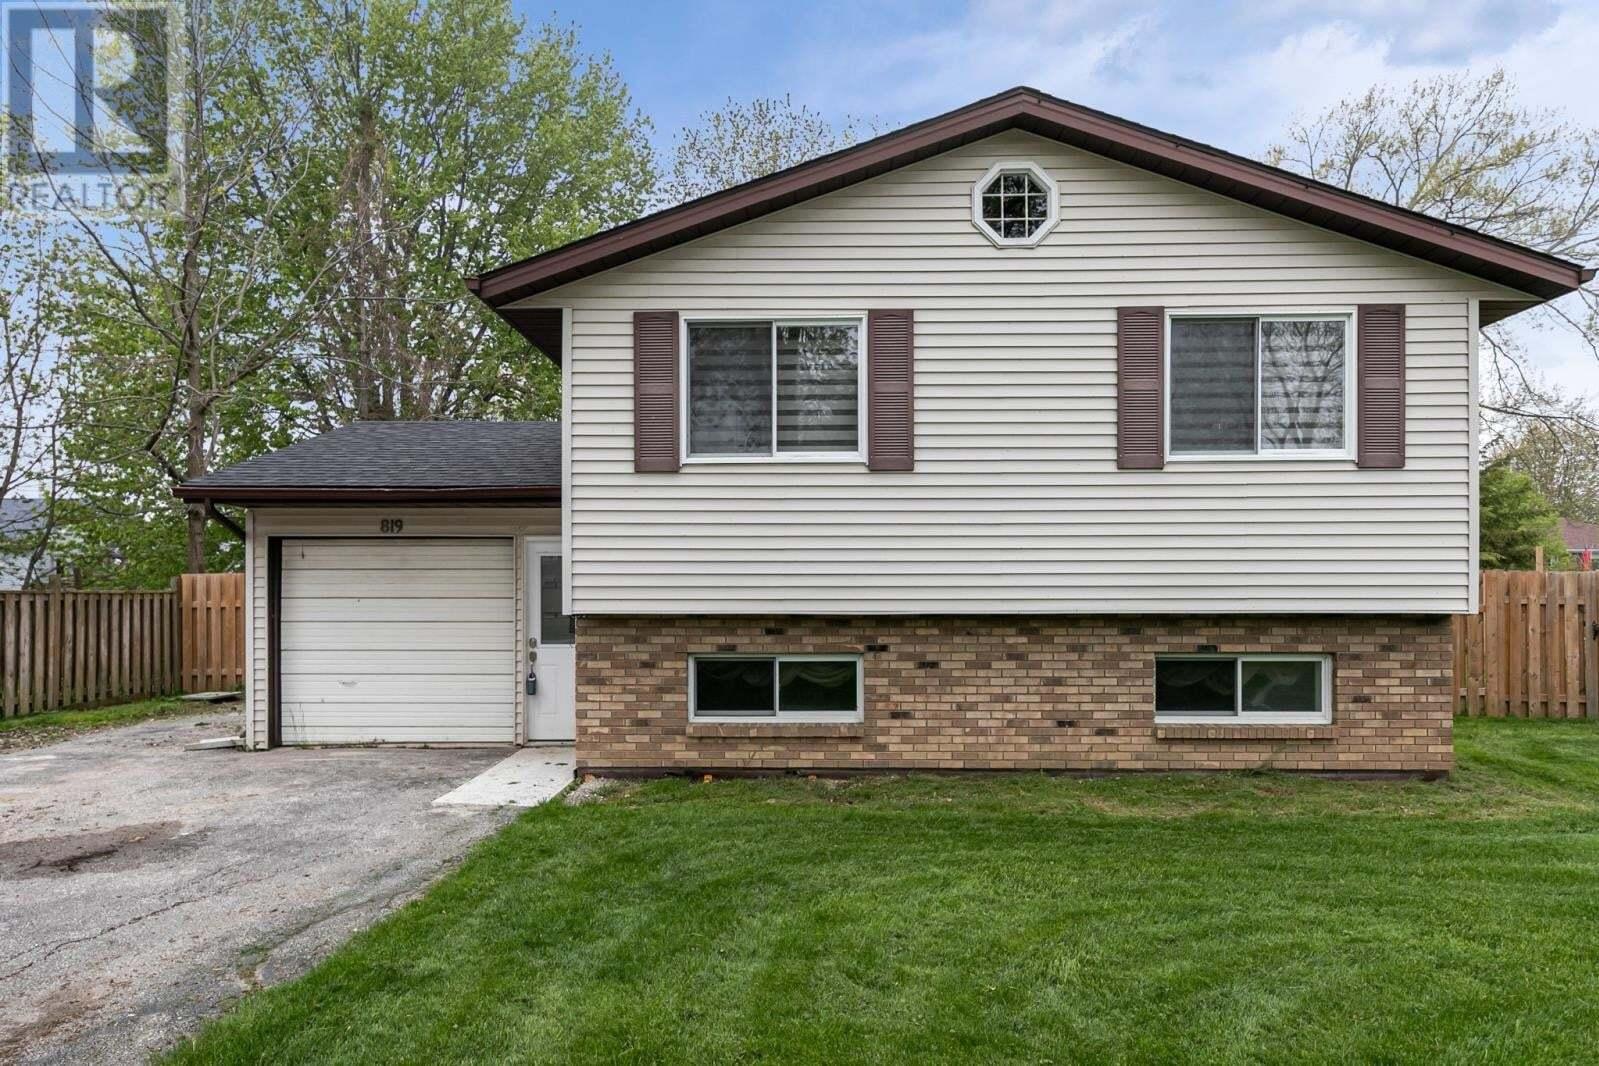 House for sale at 819 Lawndale  Kingsville Ontario - MLS: 20005729